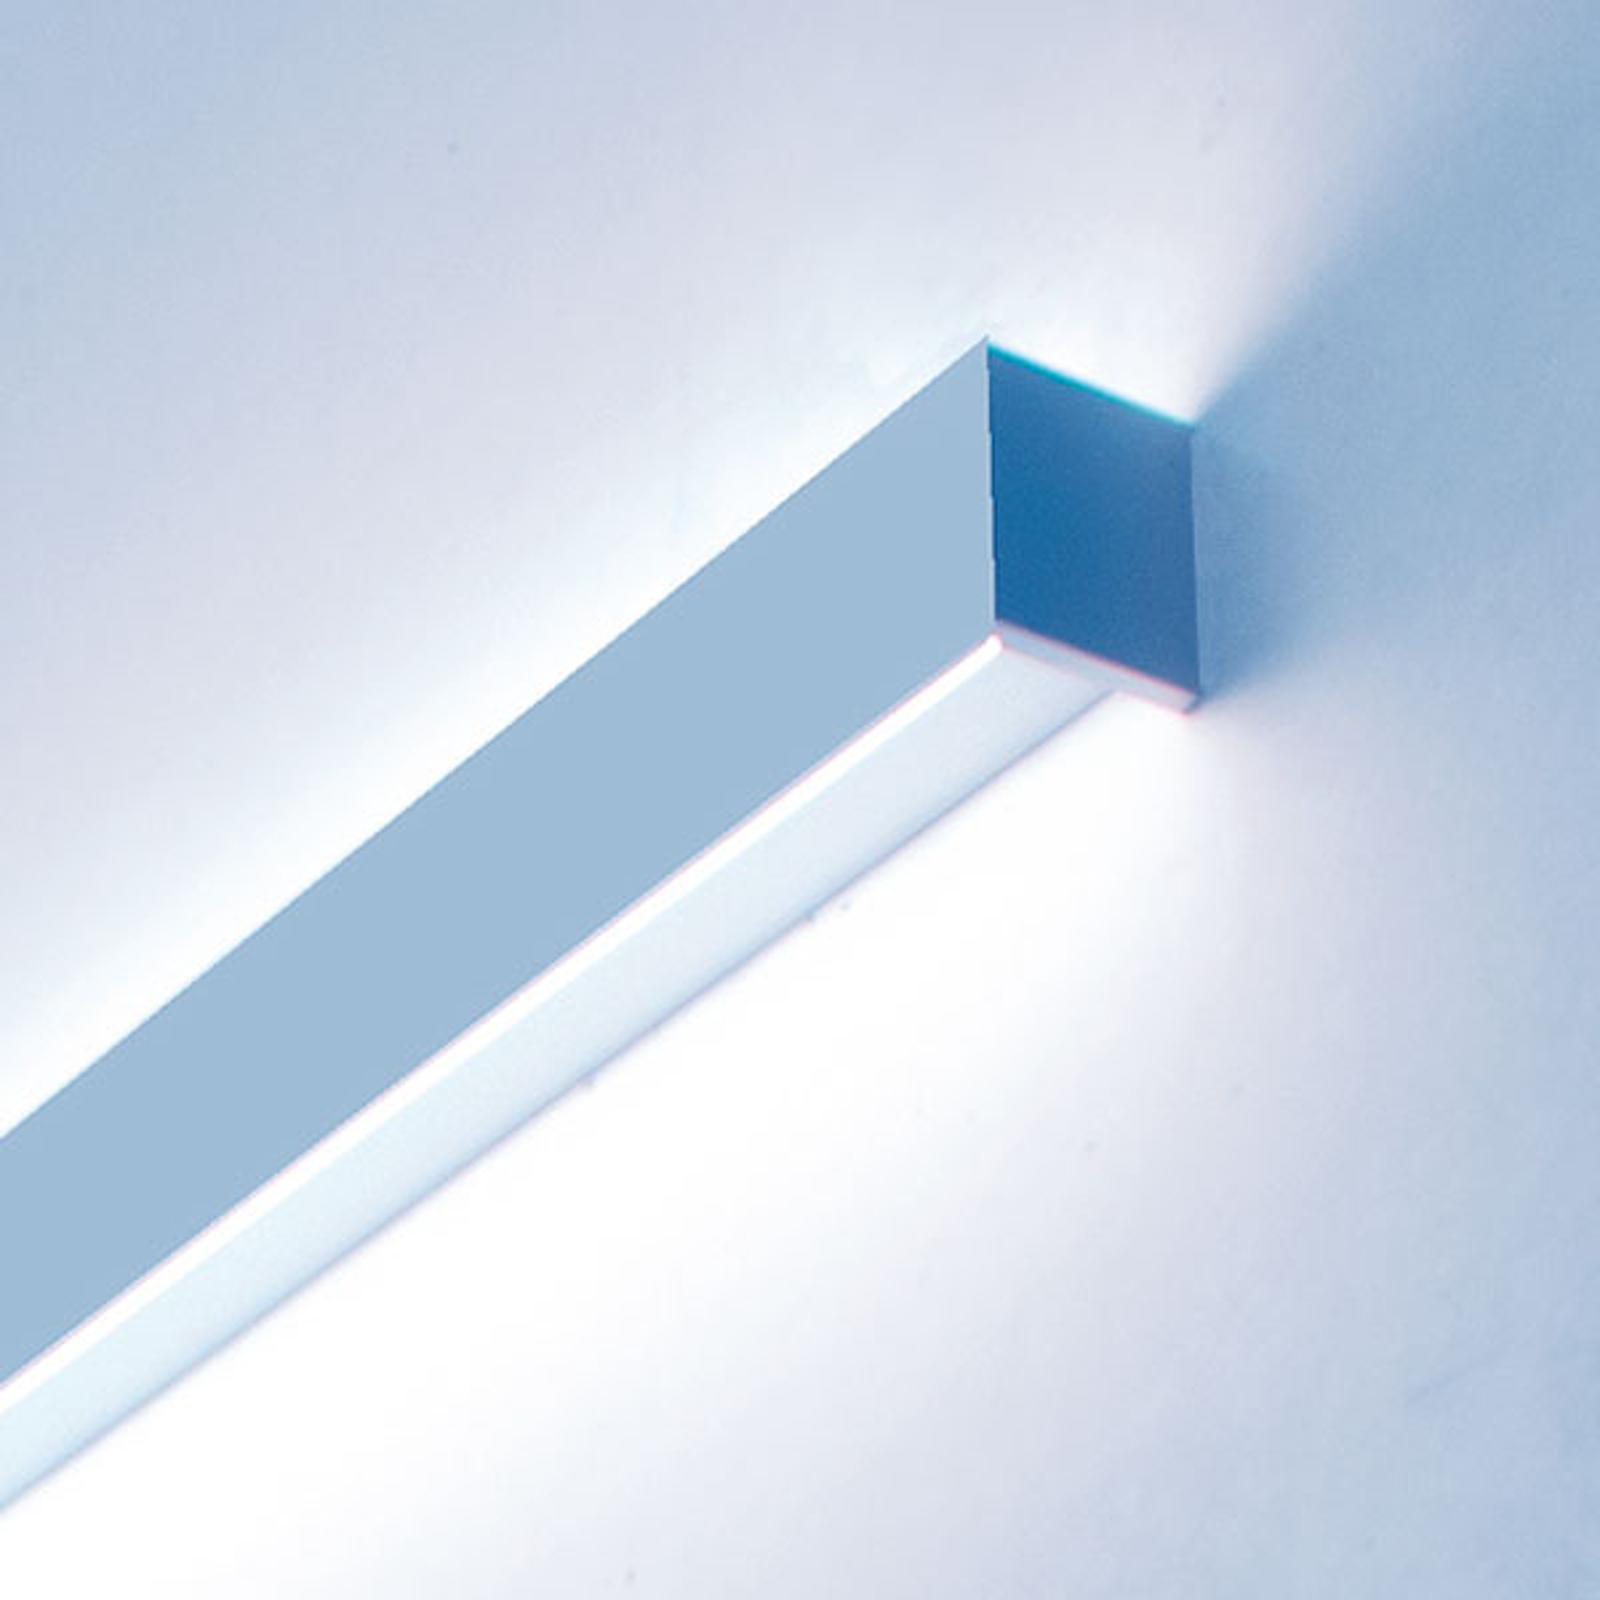 Kinkiet LED Matric W1 60 cm, 4000K